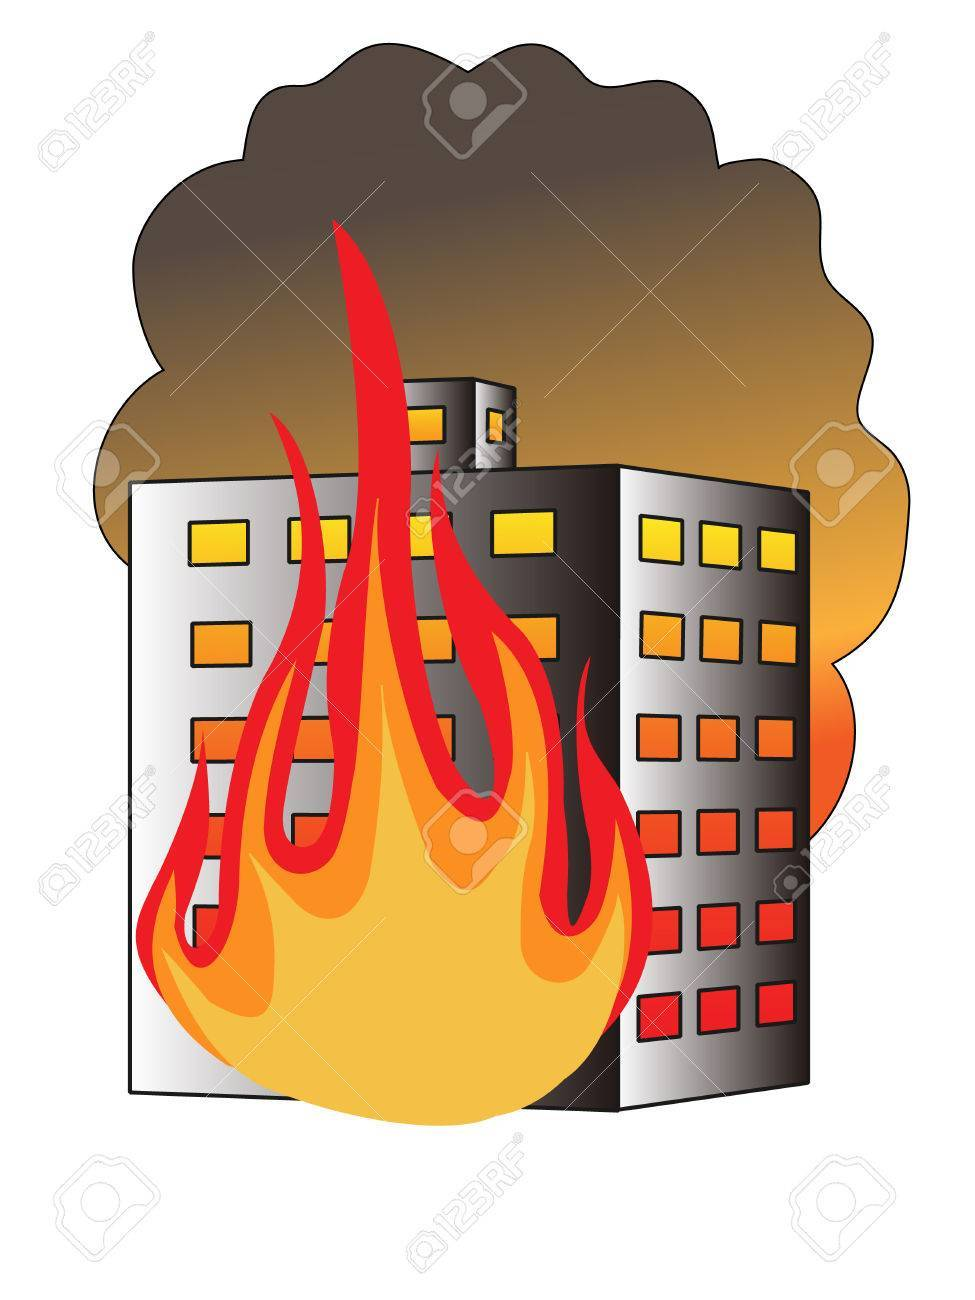 Building on fire clipart 2 » Clipart Portal.